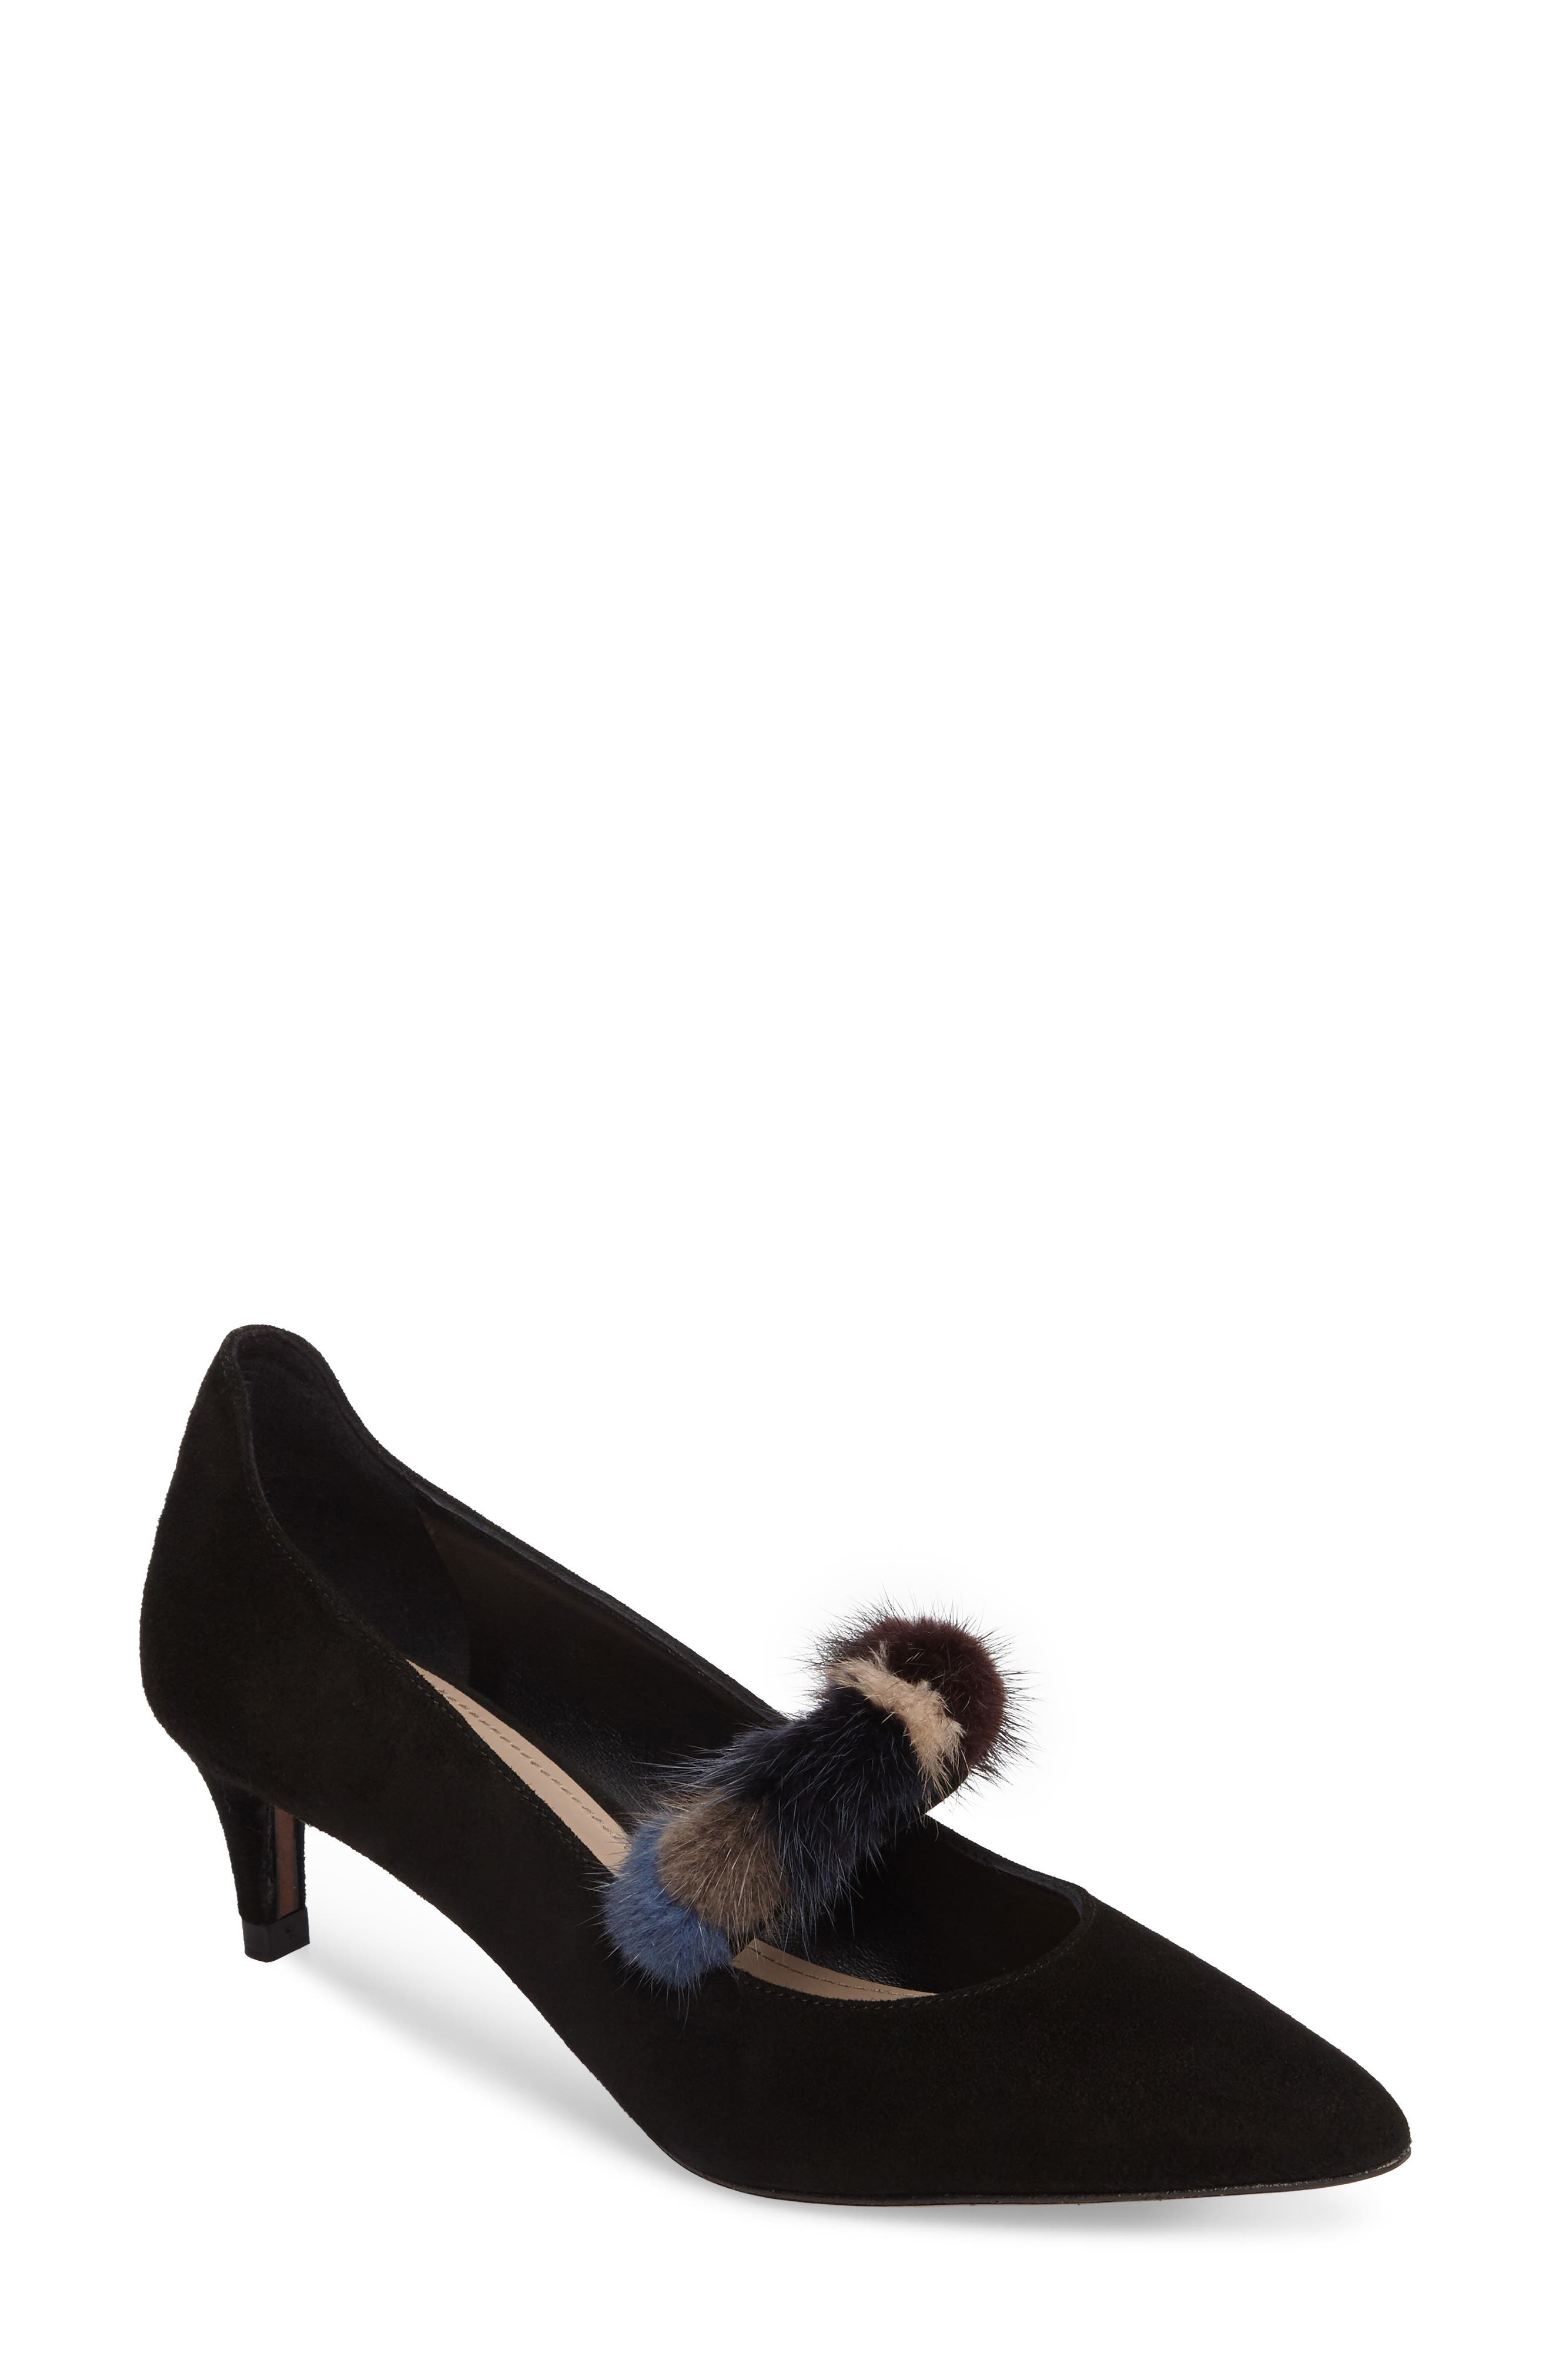 Alternate Image 1 Selected - Donald Pliner Blake Genuine Mink Fur Pump (Women)